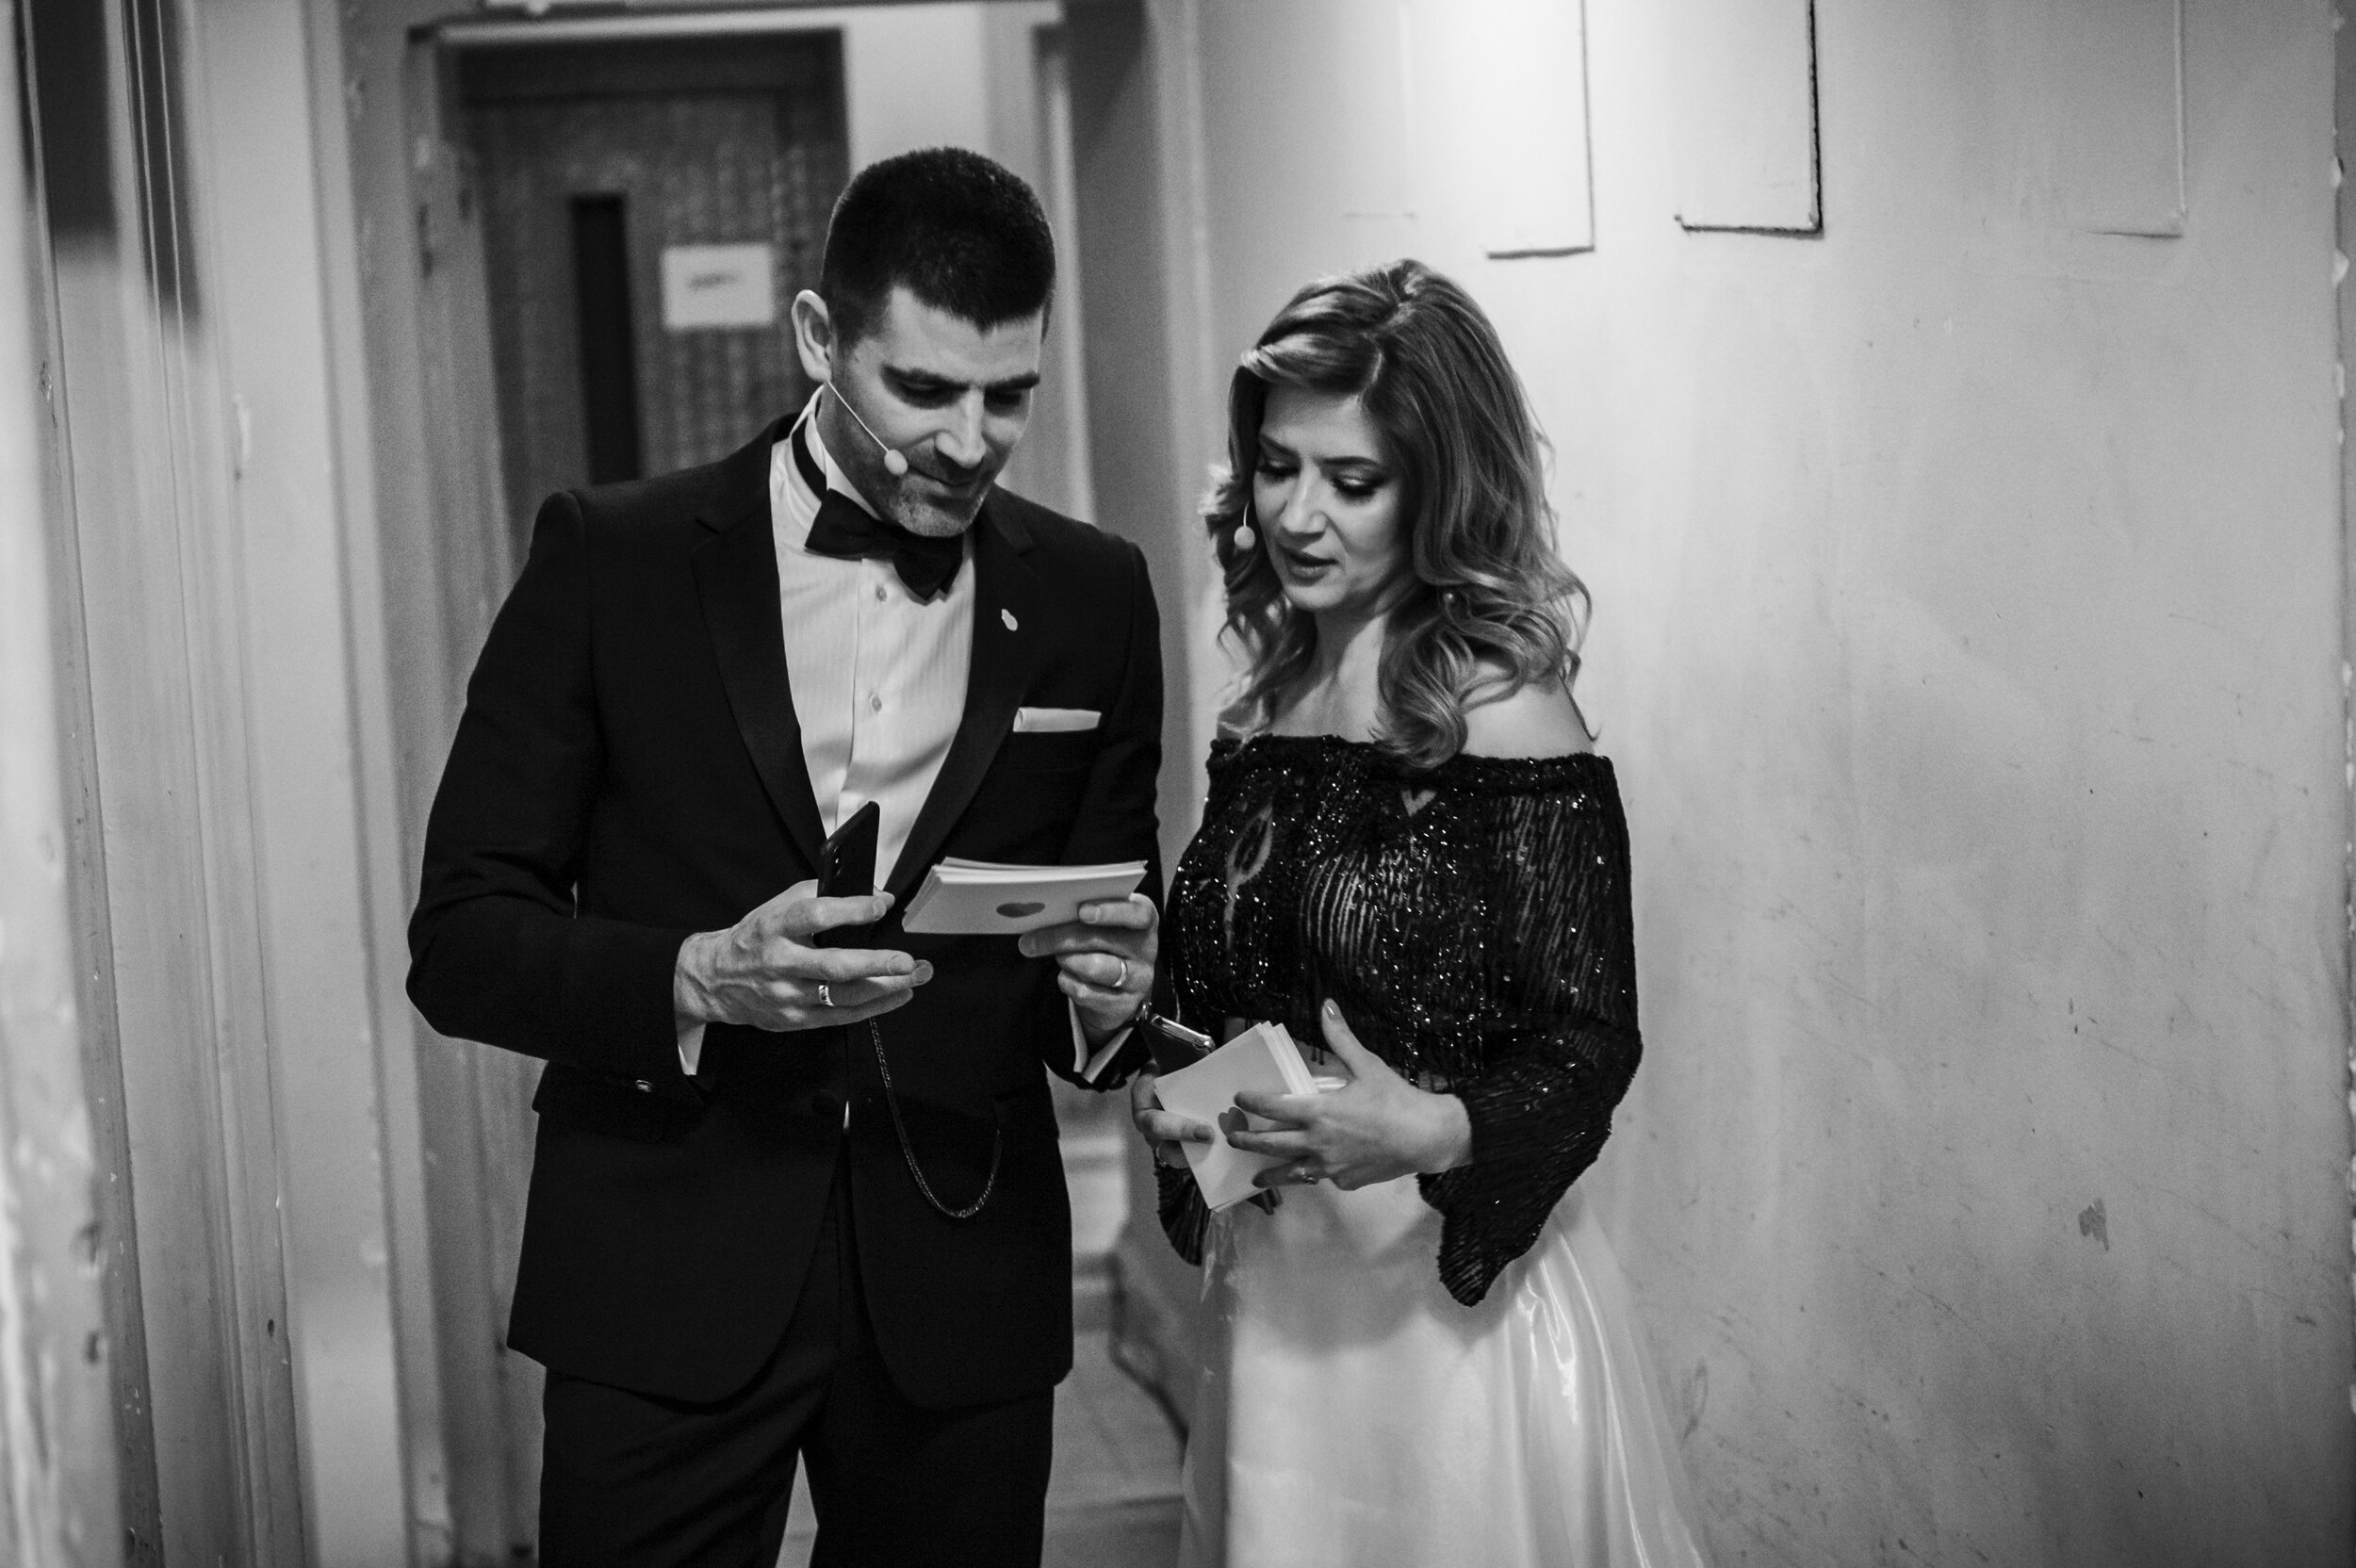 Amalia Enache_Dragoș Bucurenci_Hope Concert 2019_Foto The Storyalist.jpg